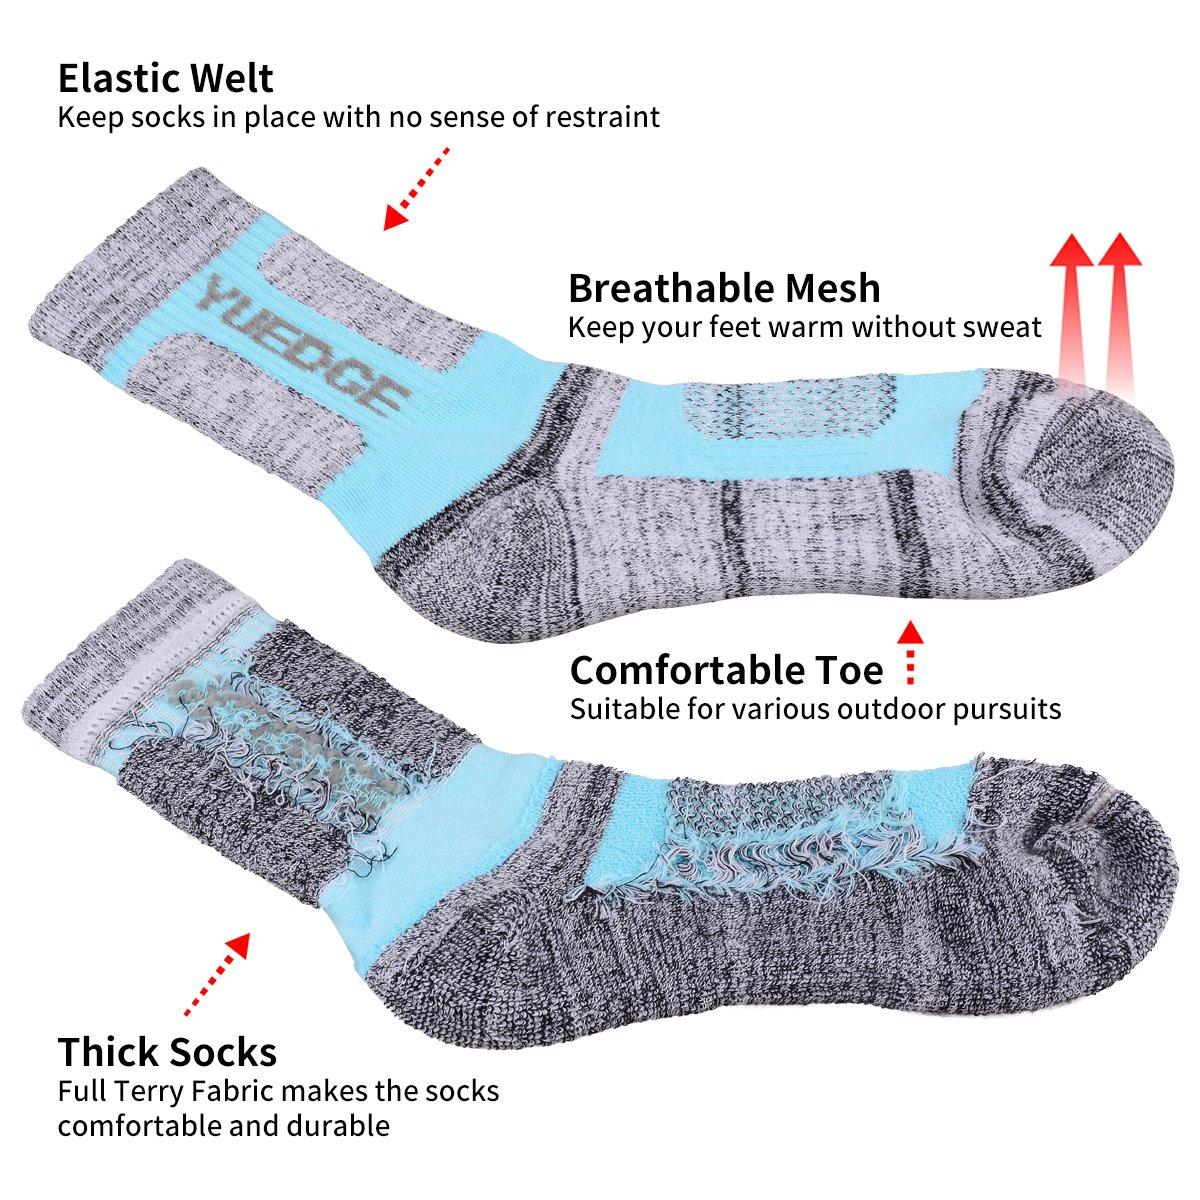 YUEDGE 2 Pairs Womens Walking Socks Wicking Cushion Breathable Crew Socks Outdoor Multi Performance Hiking Trekking Running Socks